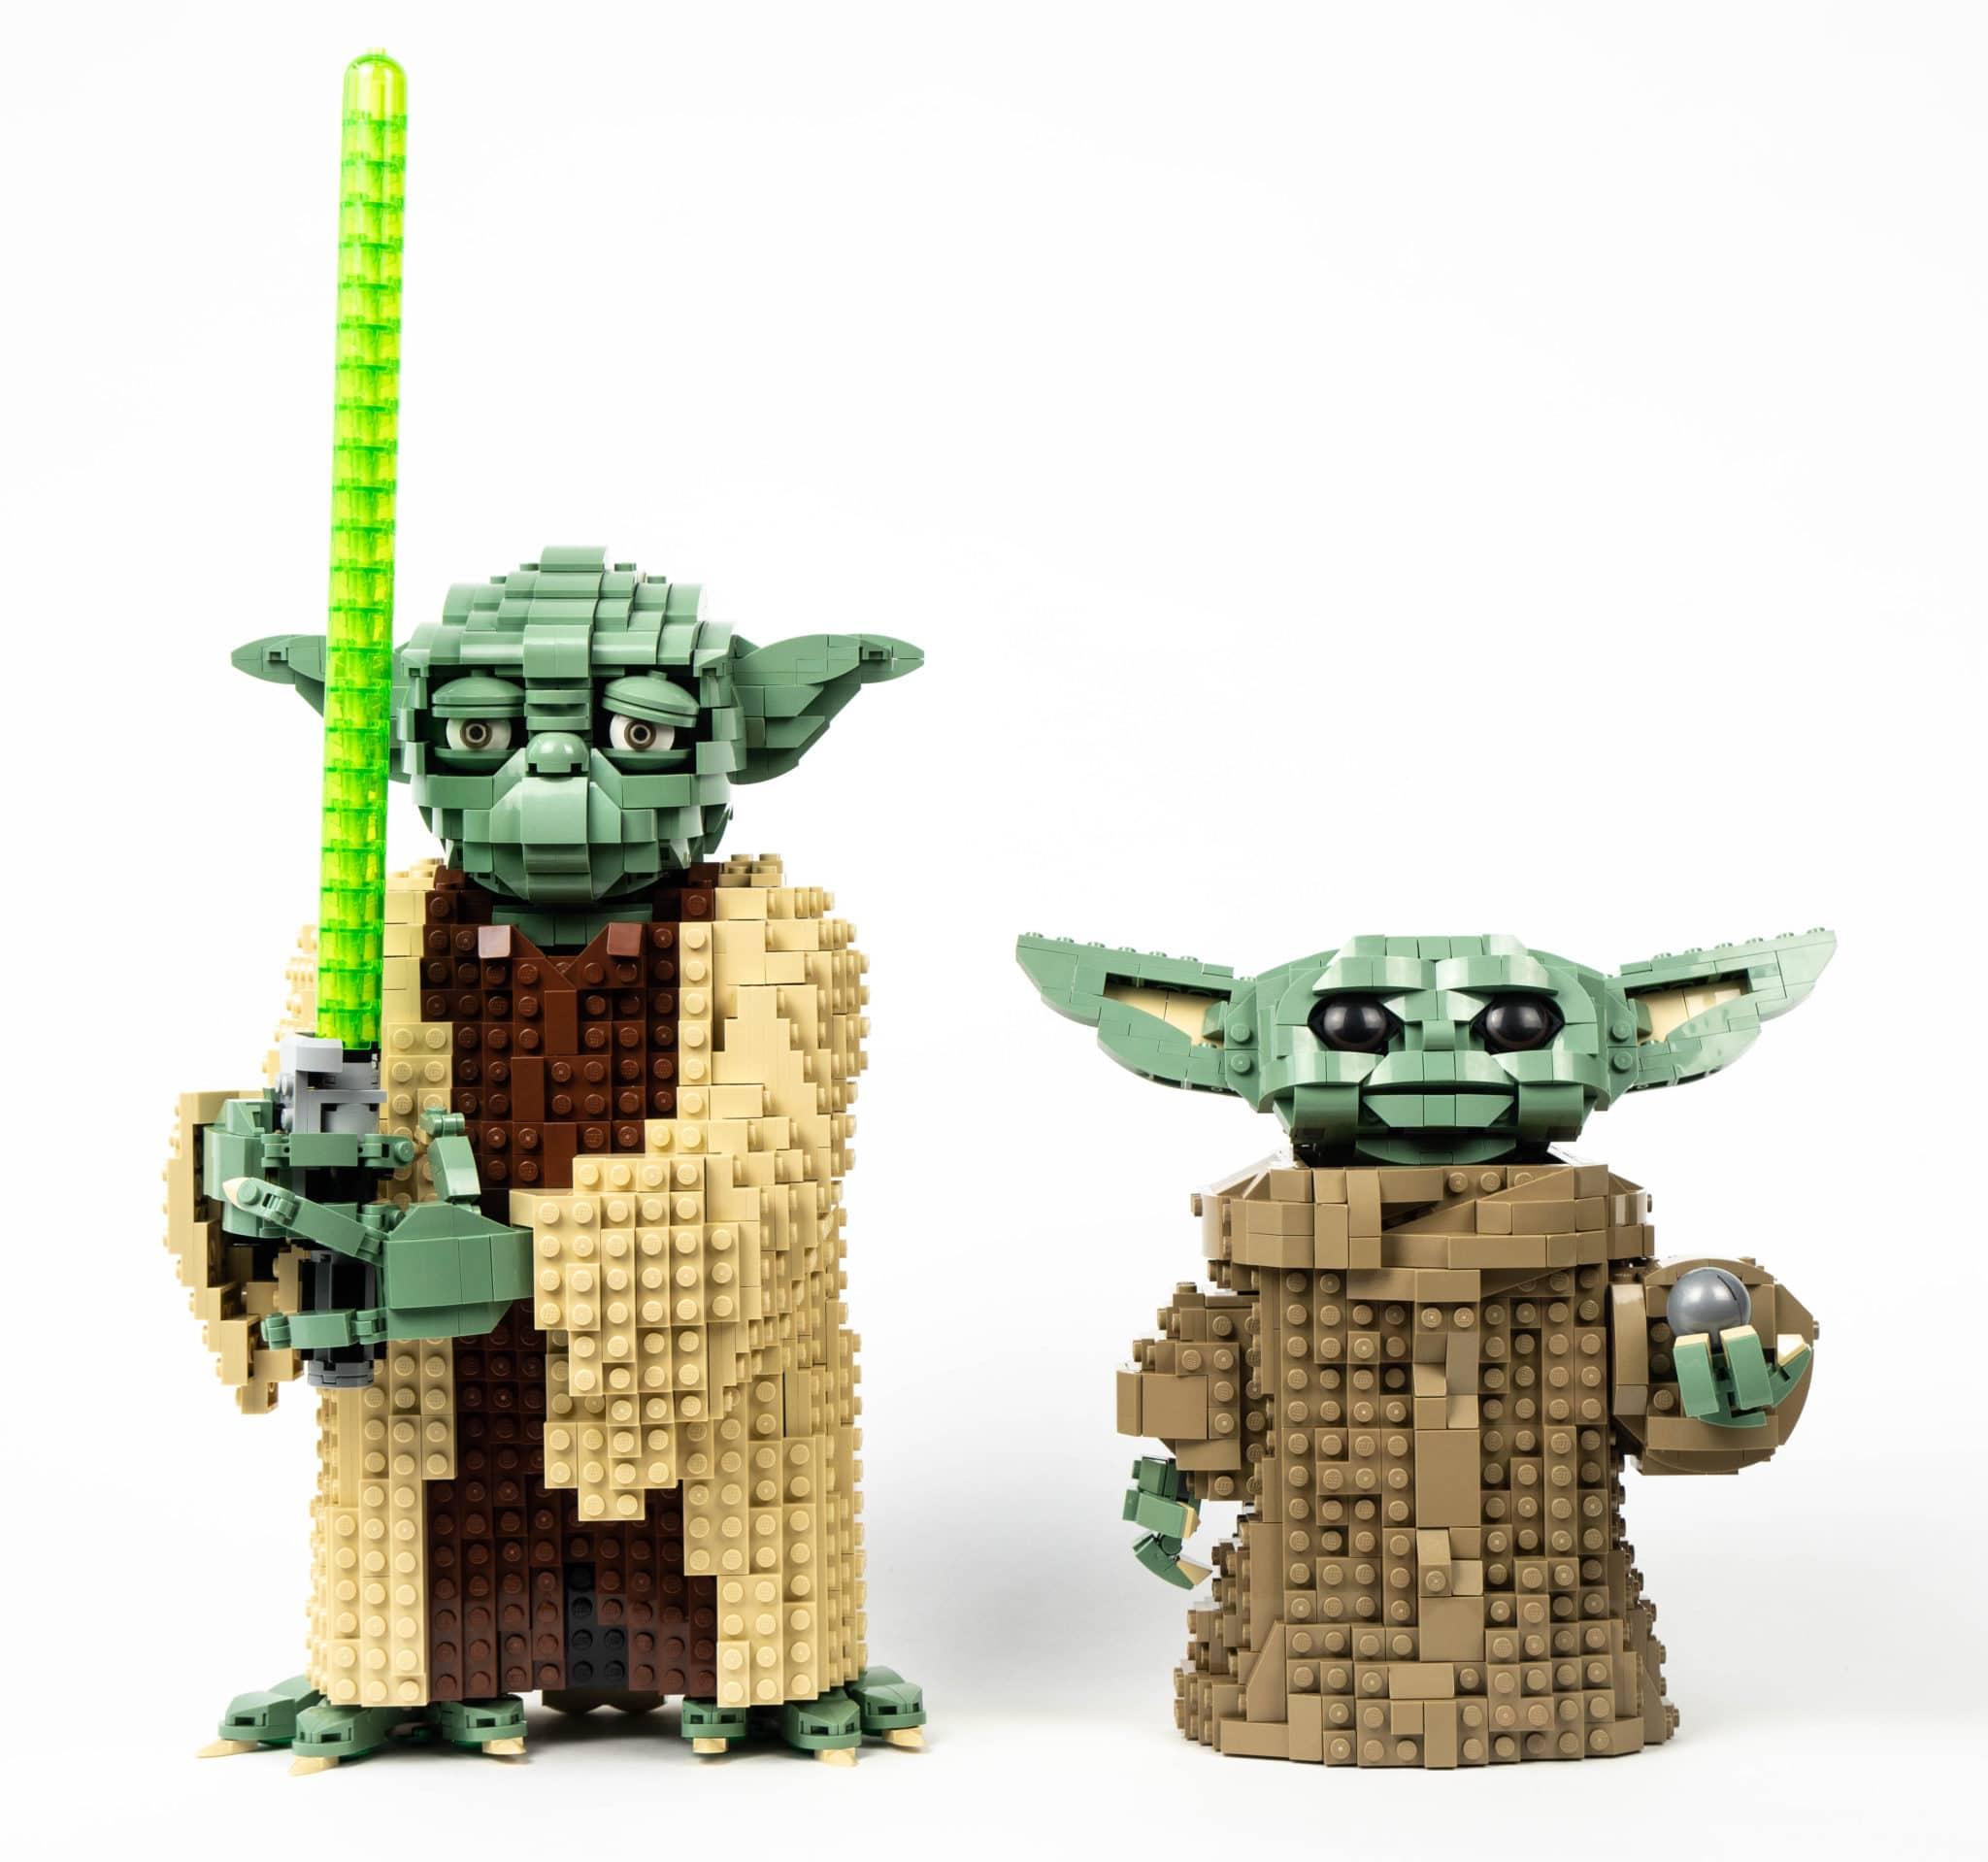 LEGO Star Wars 75318 Vs 75255